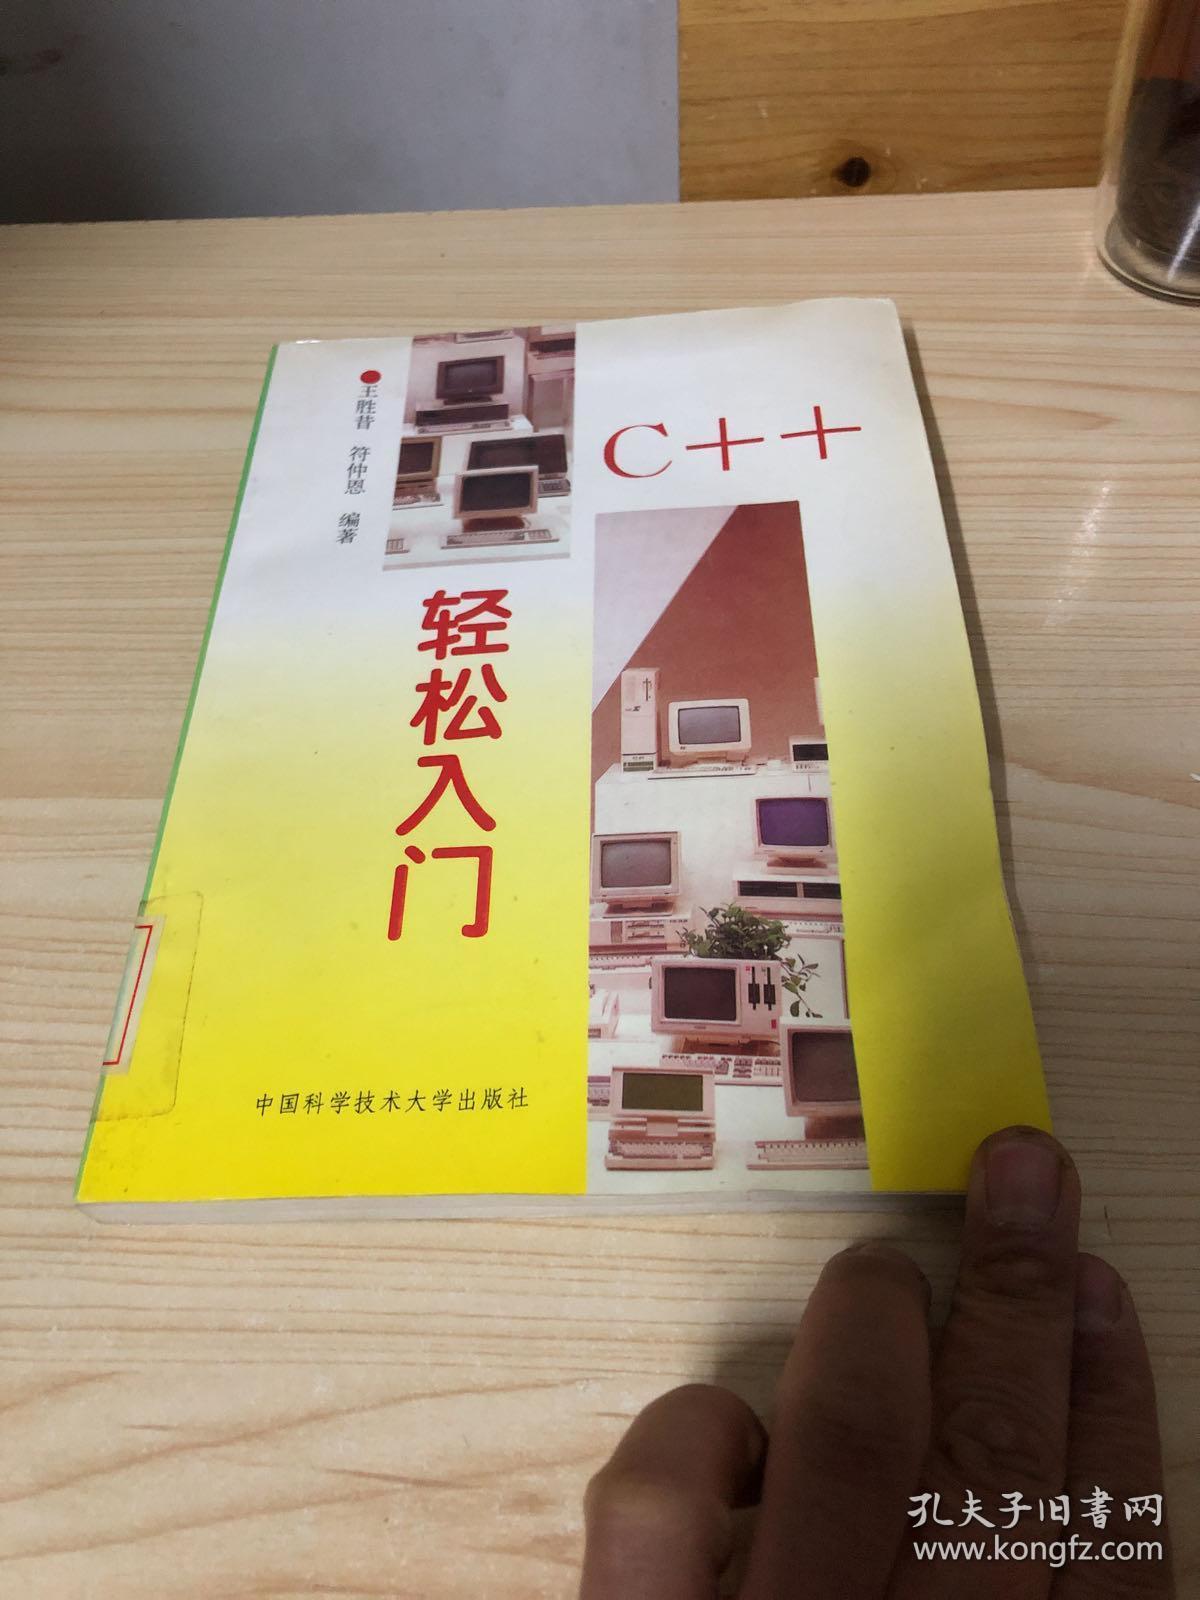 C++轻松入门